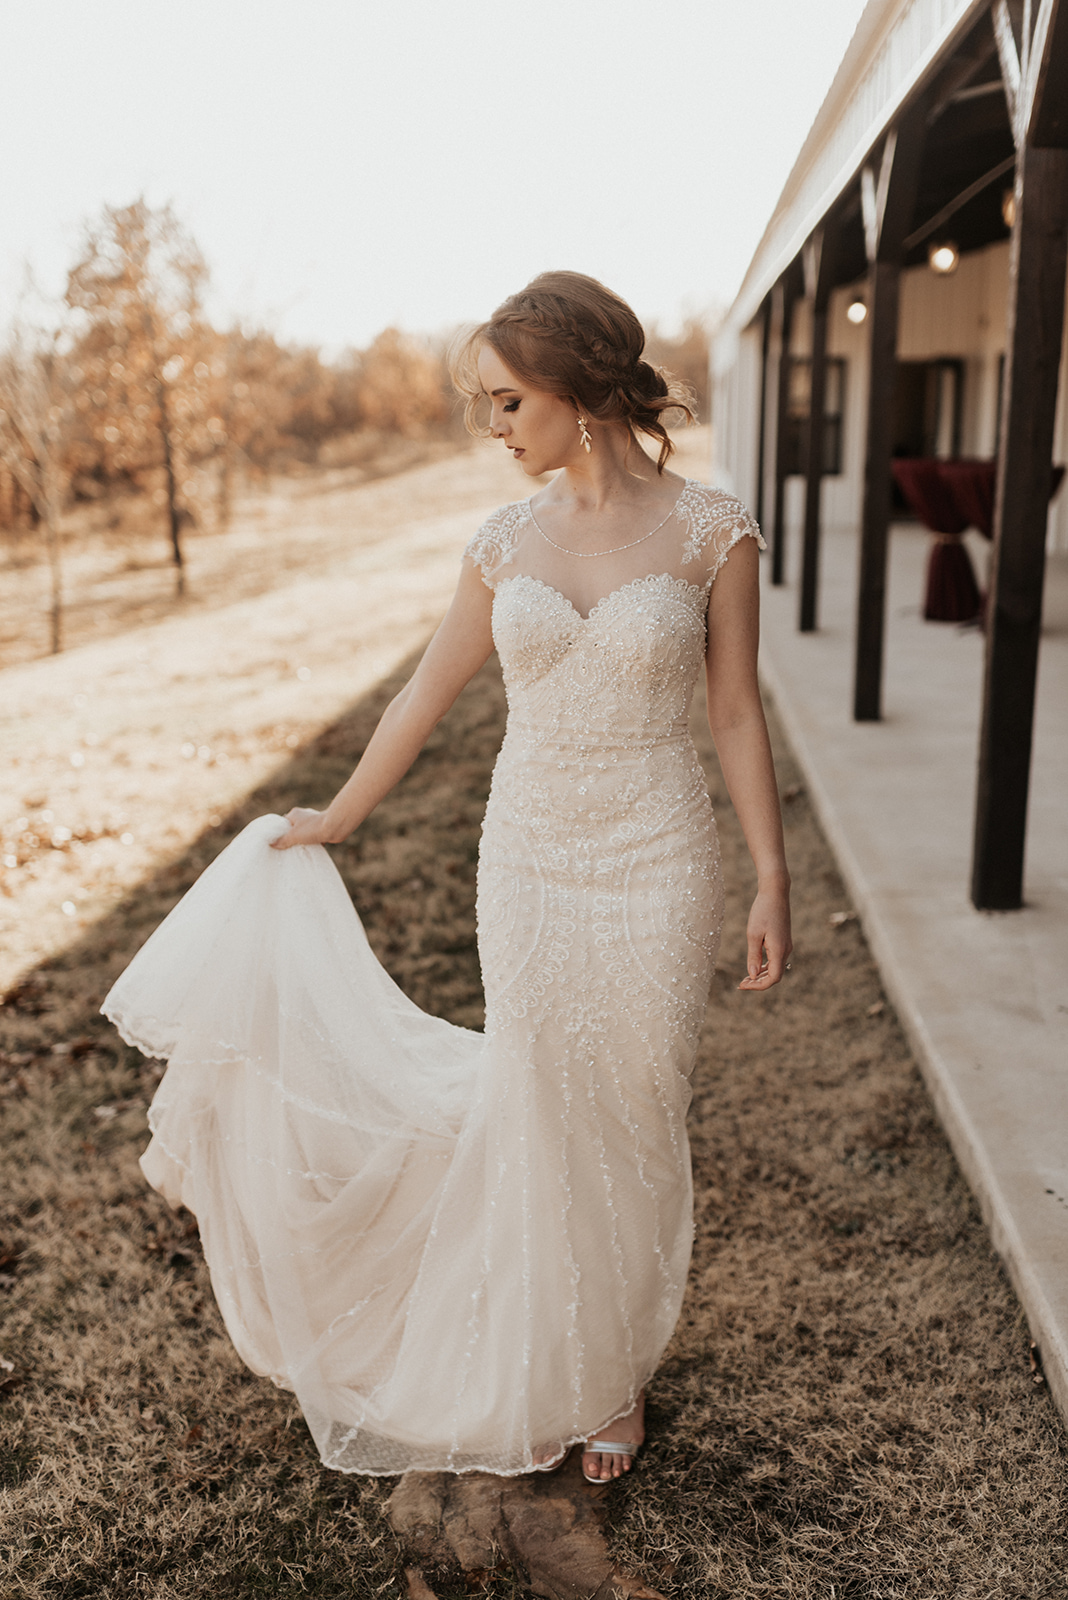 Best Wedding Venue in Tulsa Bixby Dream Point Ranch 32.jpg